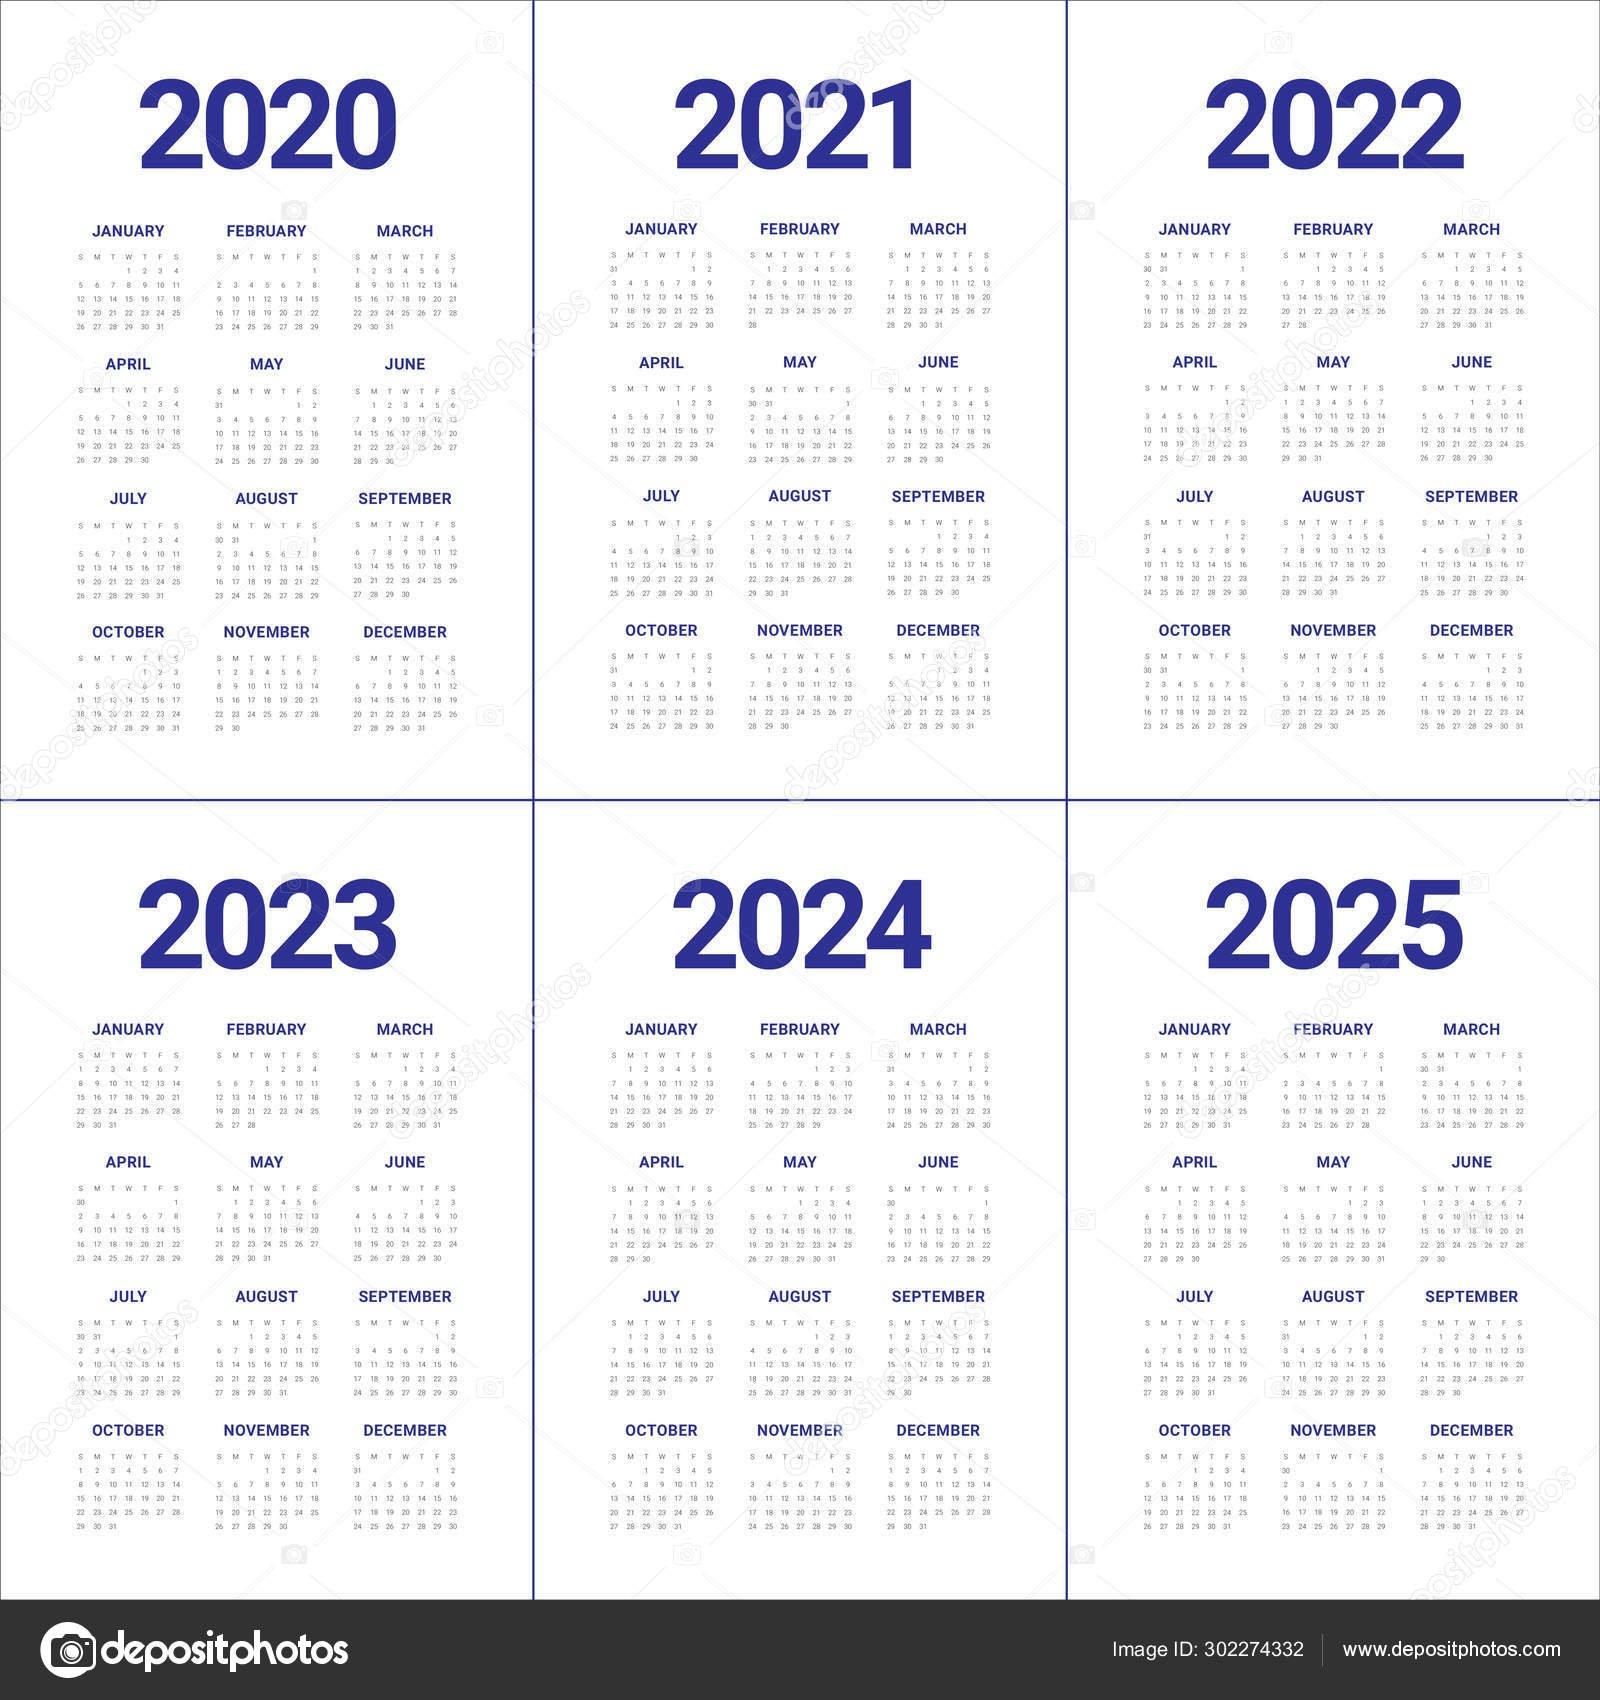 5 Year Calendar 2020 To 2025 | Printable Calendar Free 5 Year Calendar Template